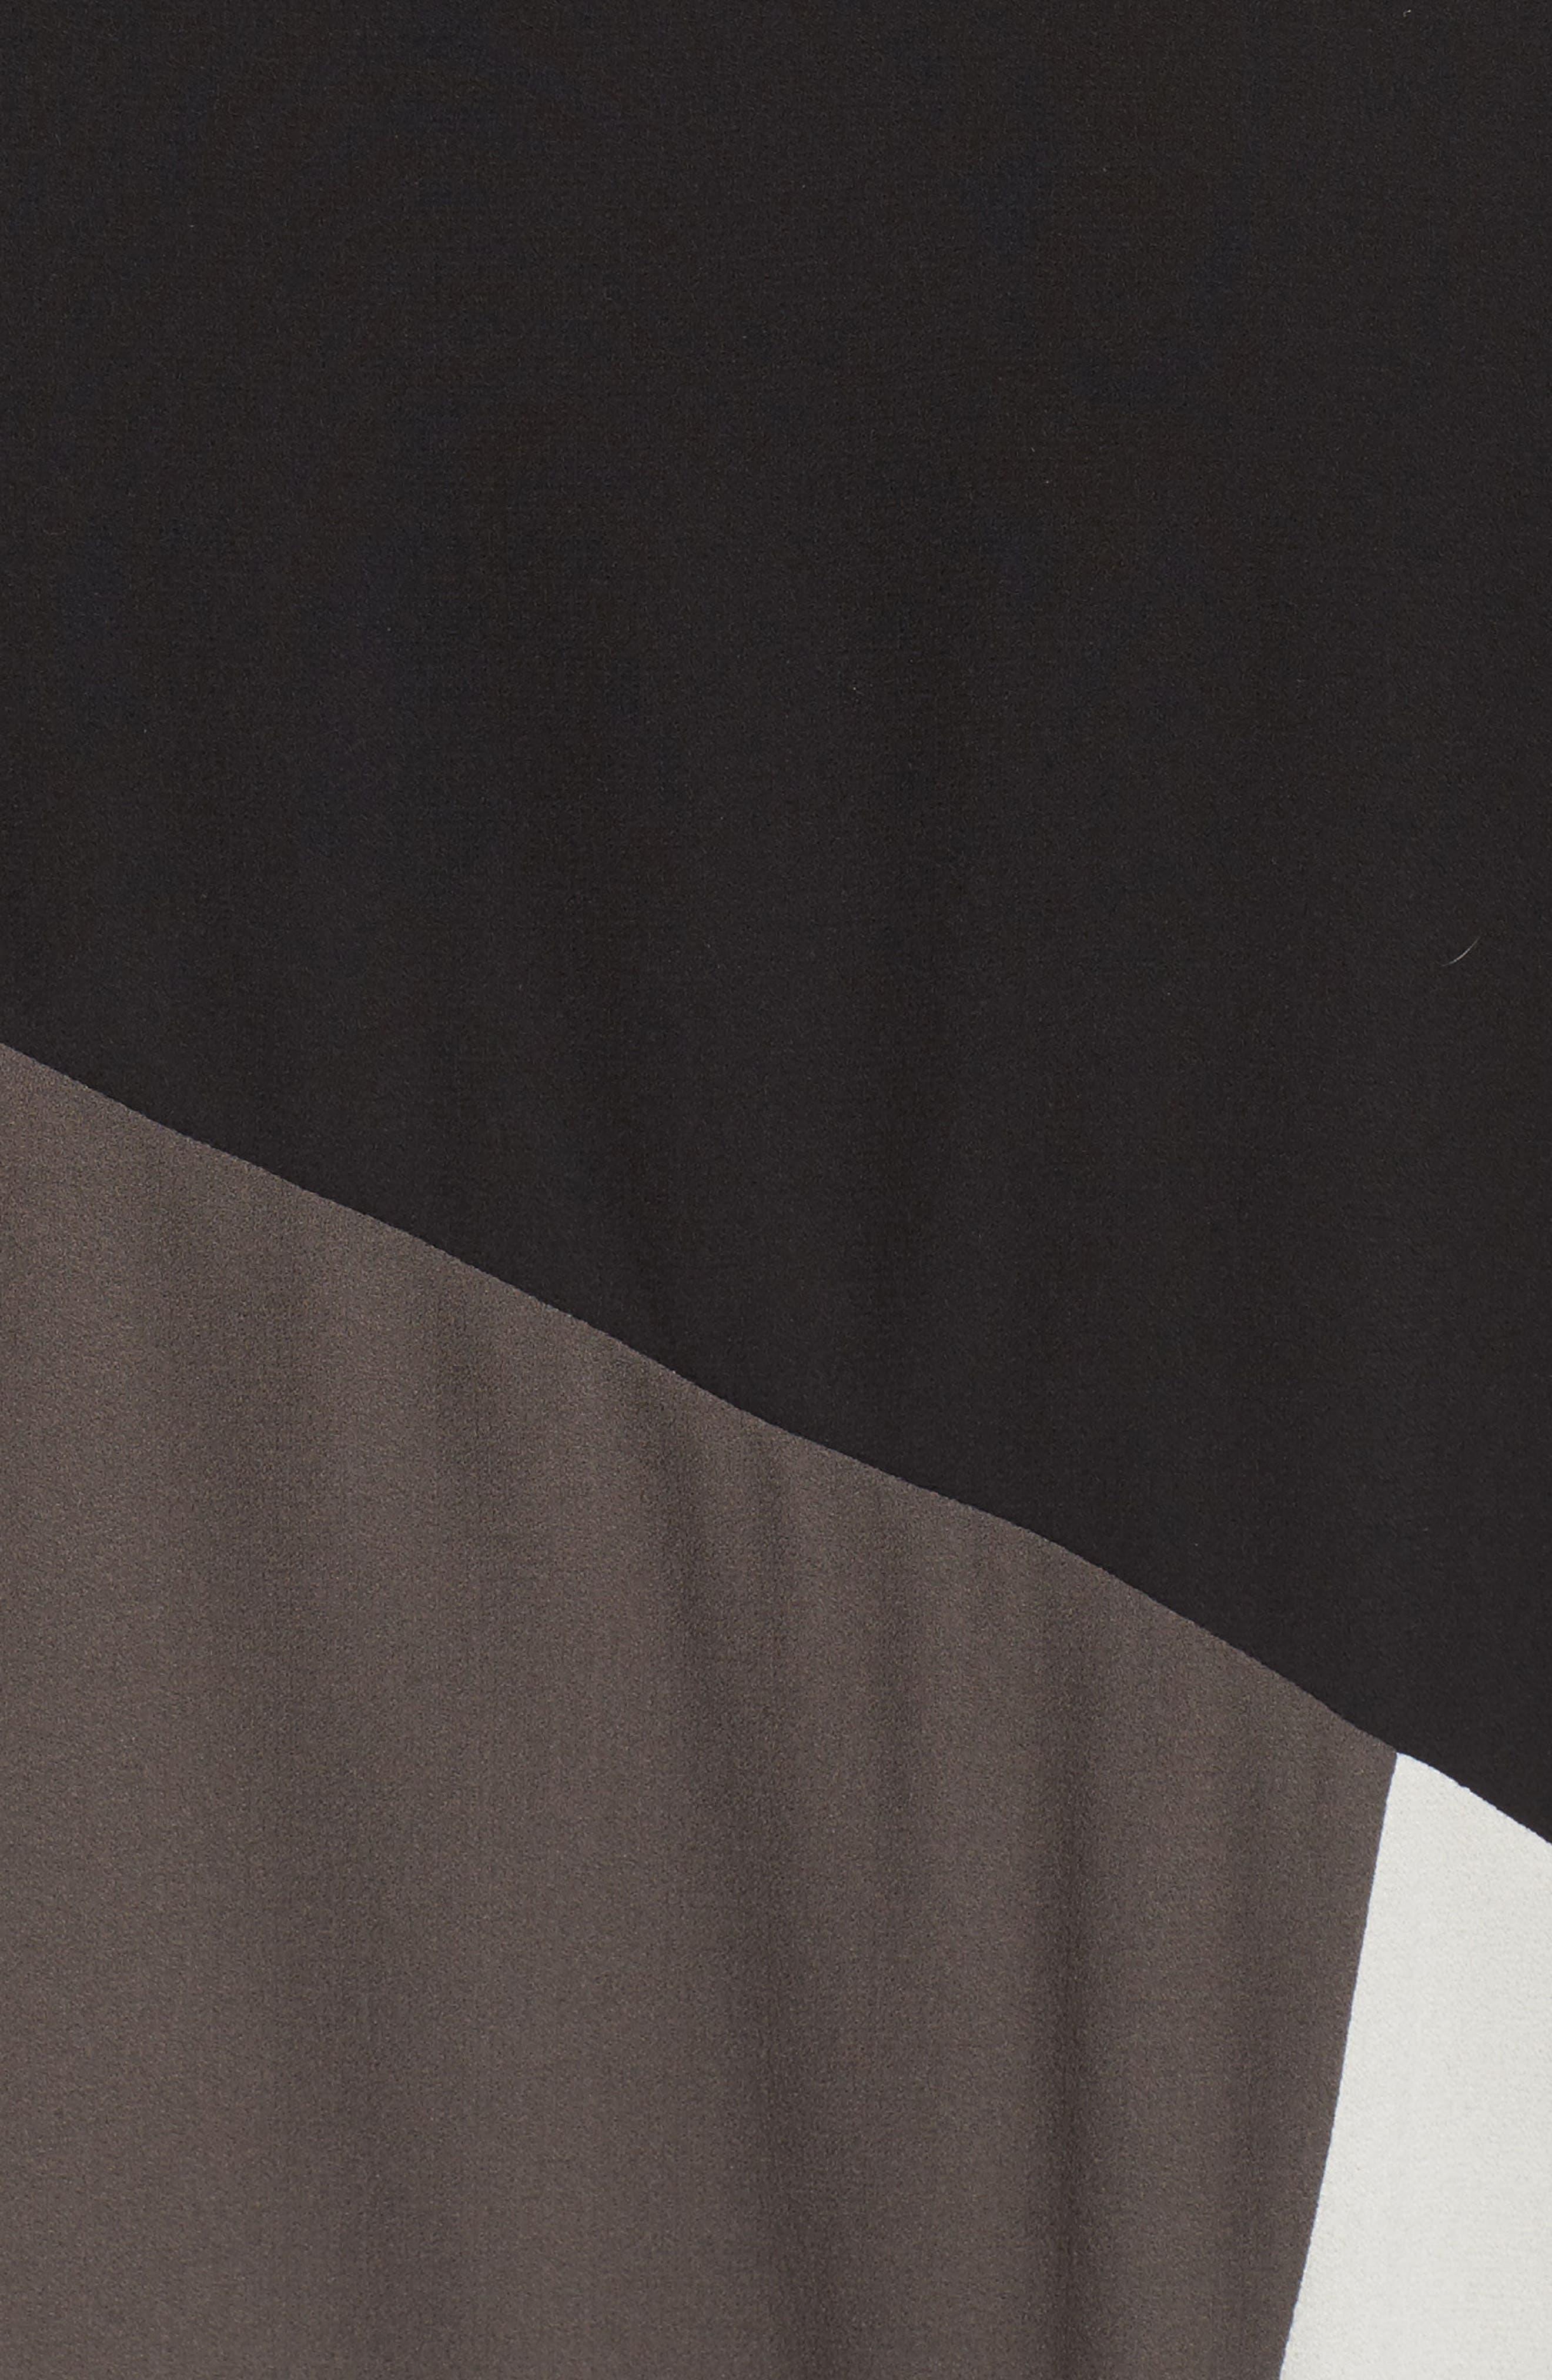 Colorblock Silk Top,                             Alternate thumbnail 5, color,                             Black